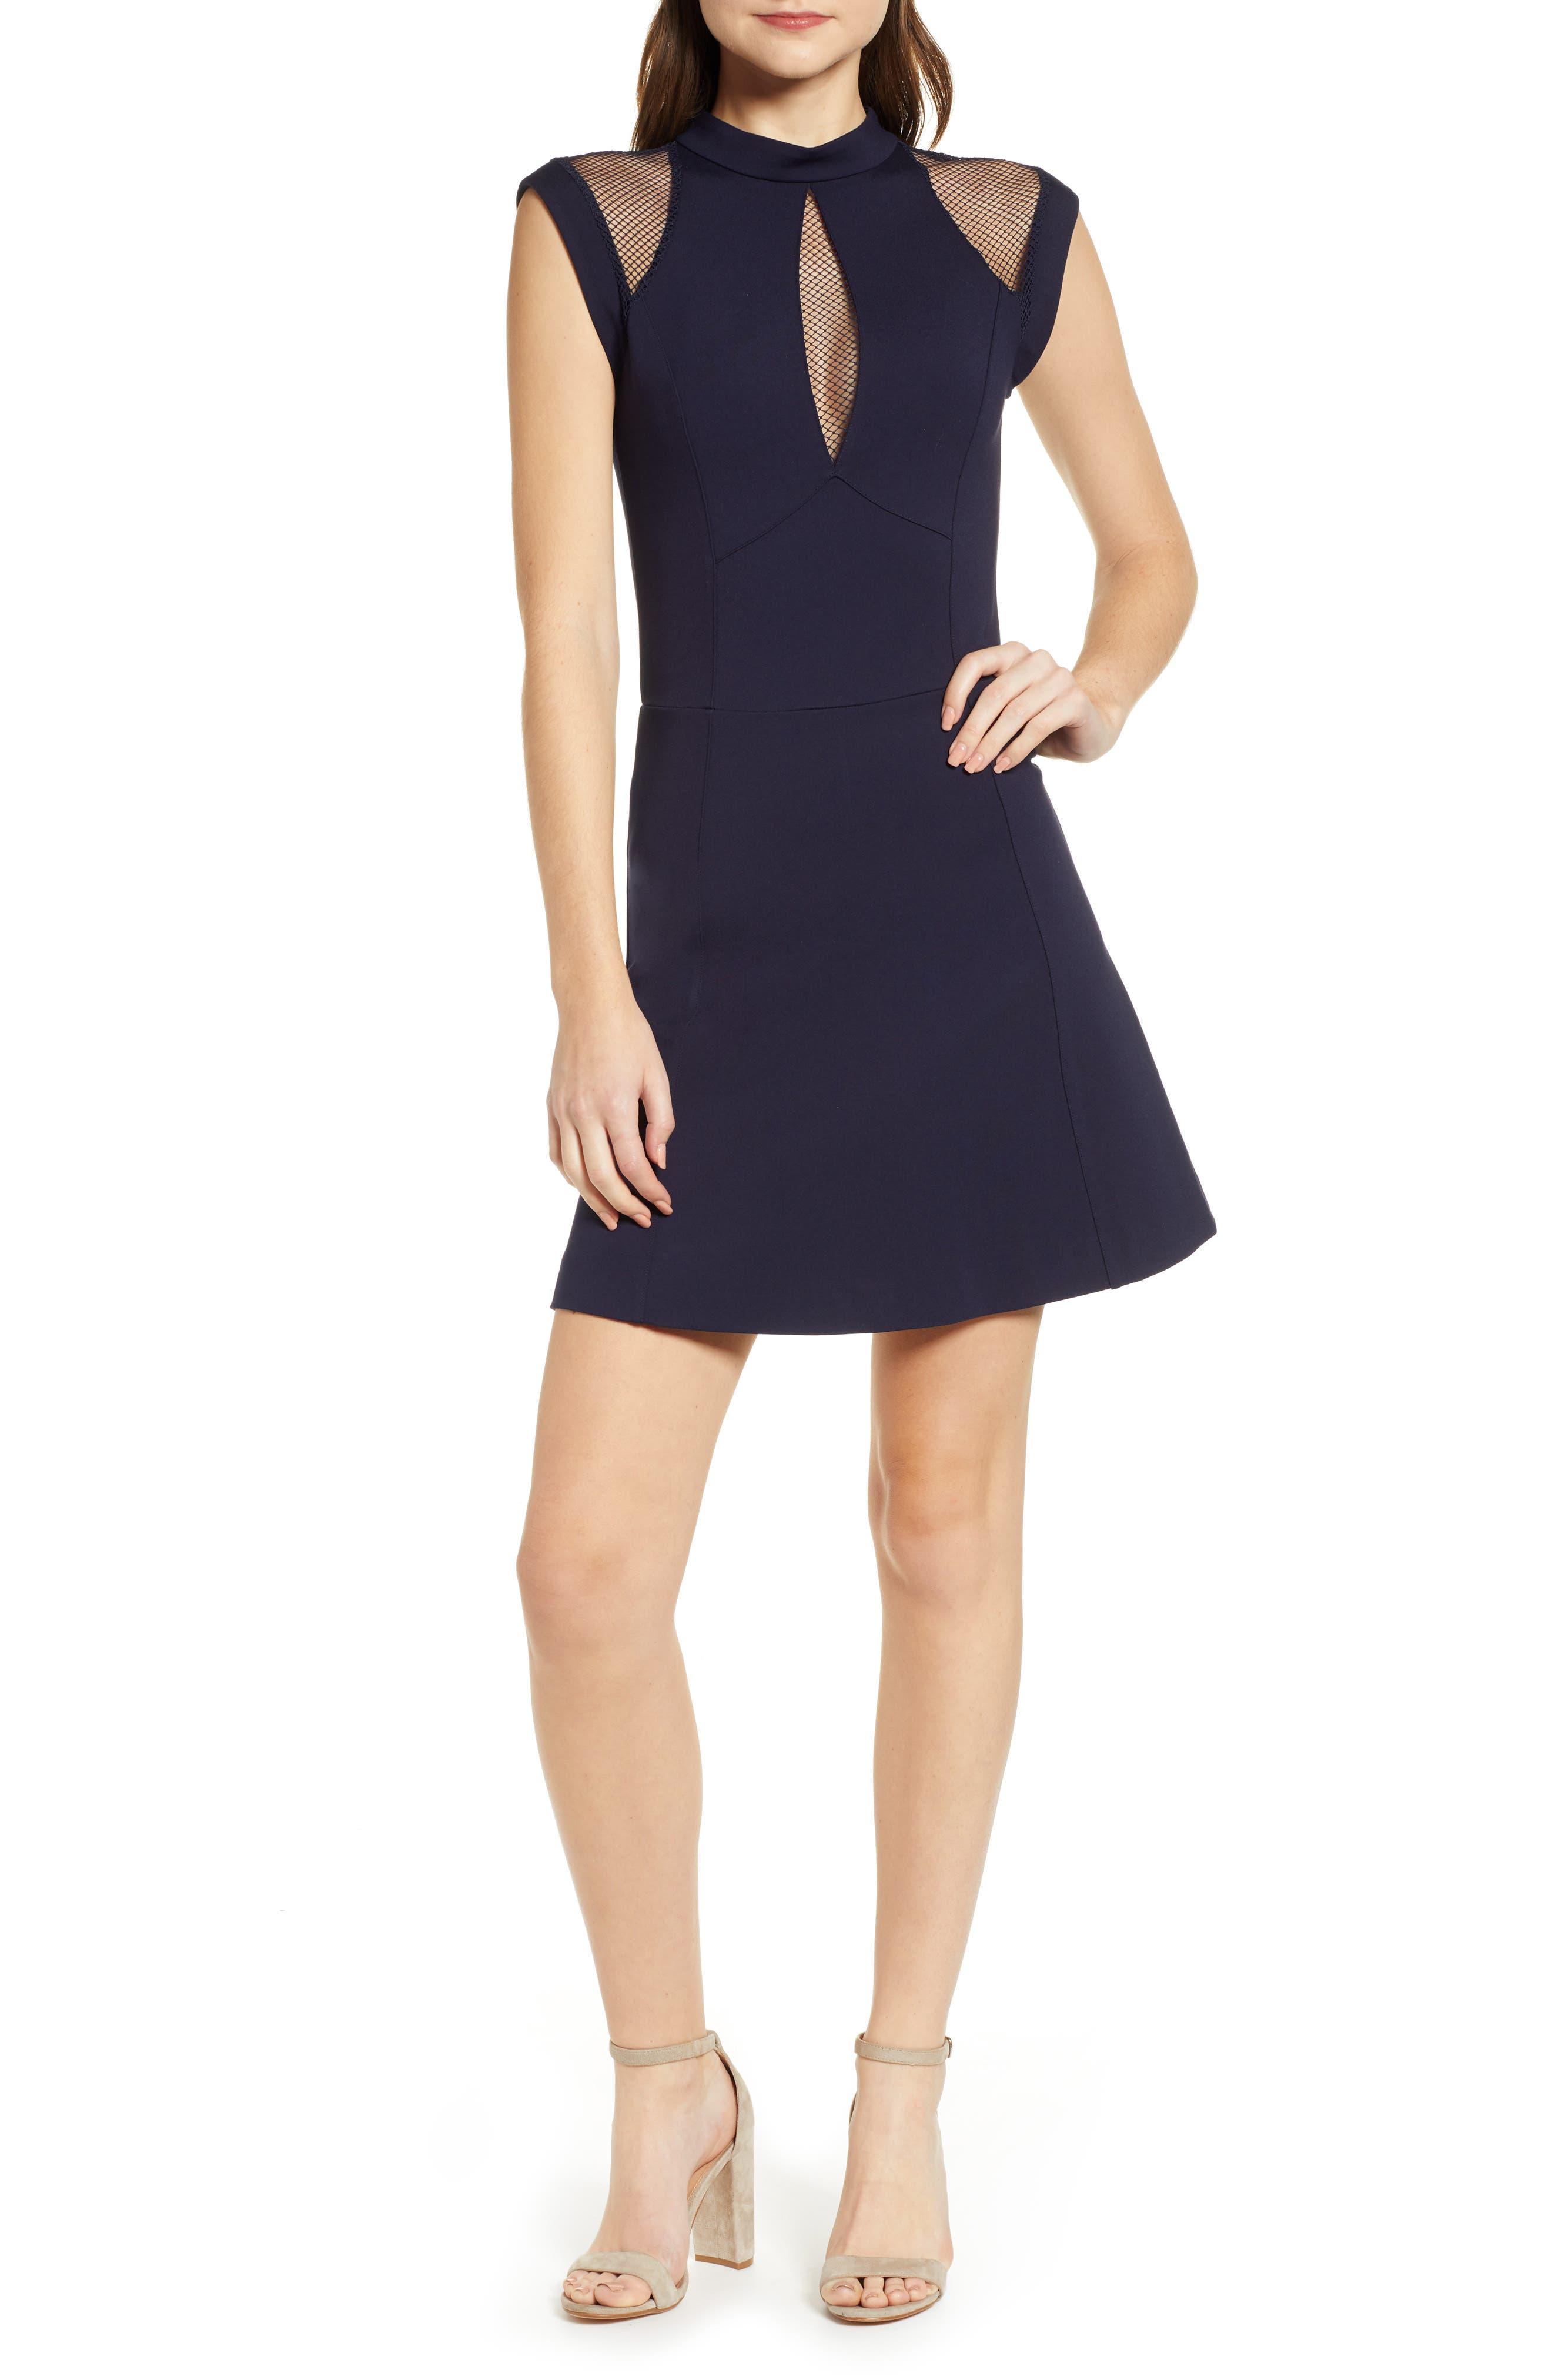 Sentimental Ny Galactica Fit & Flare Dress, Blue